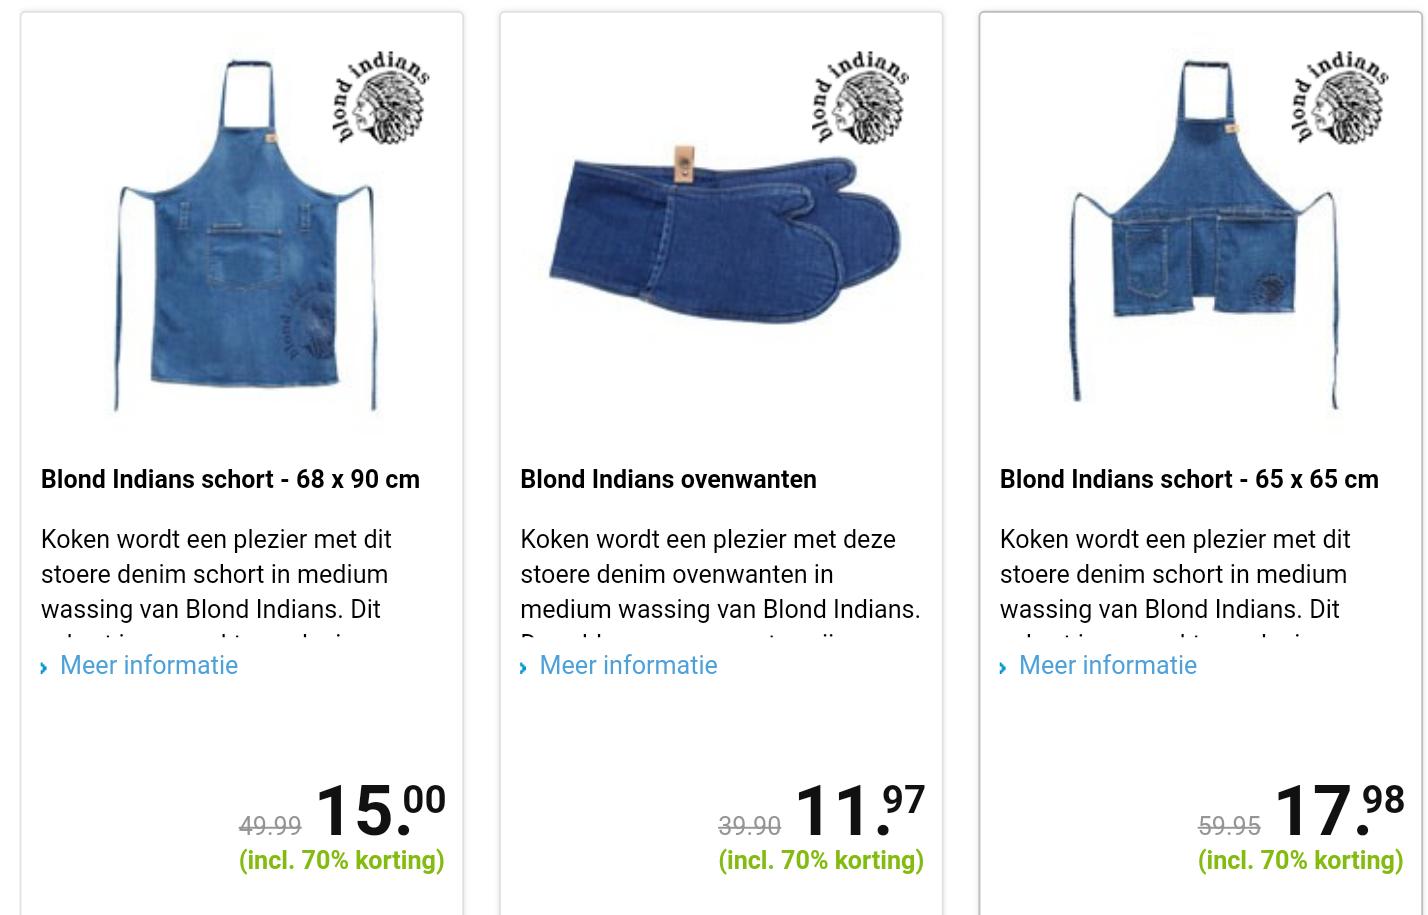 Blond Indiaas, 70% korting op artikelen van stoere denim in medium wassing.